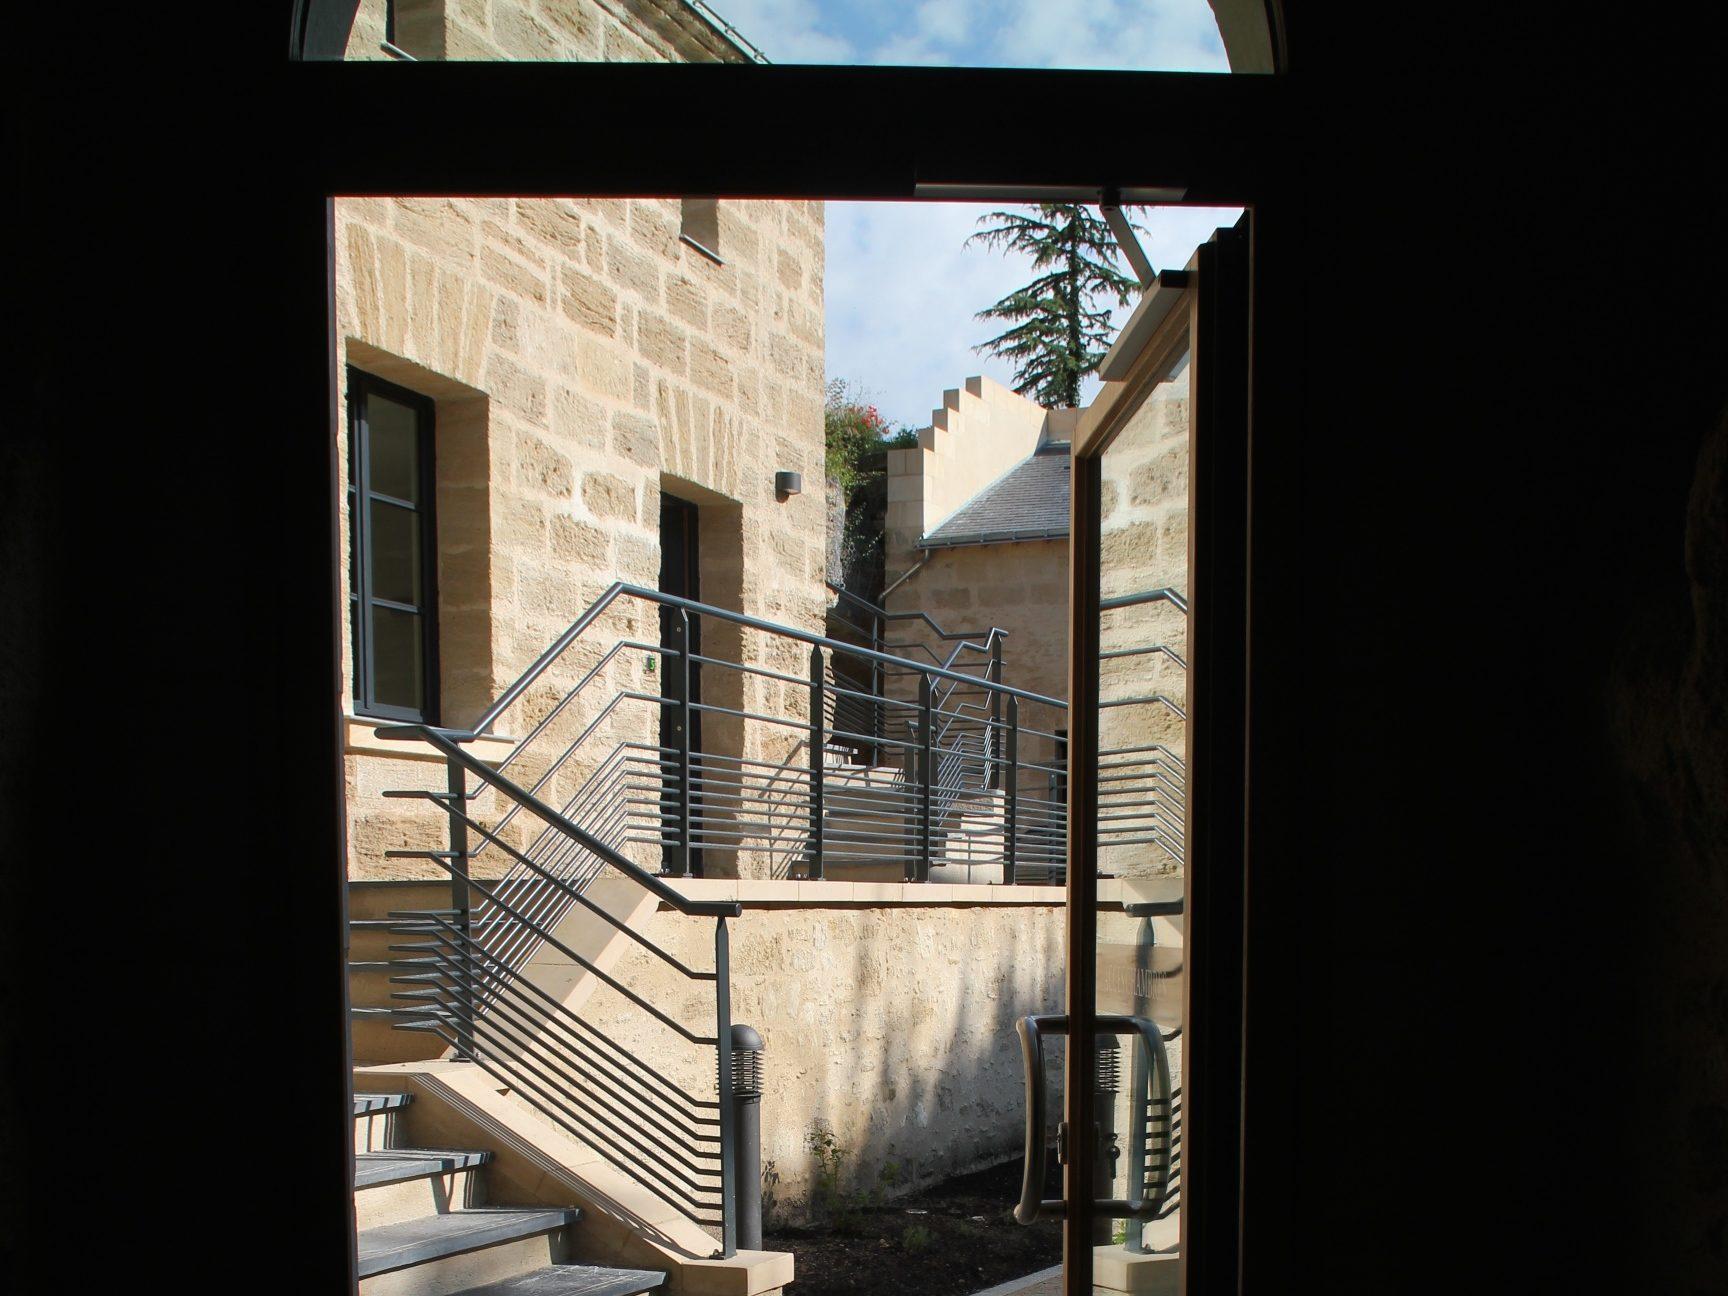 Espaces extérieurs de chambres troglodytiques